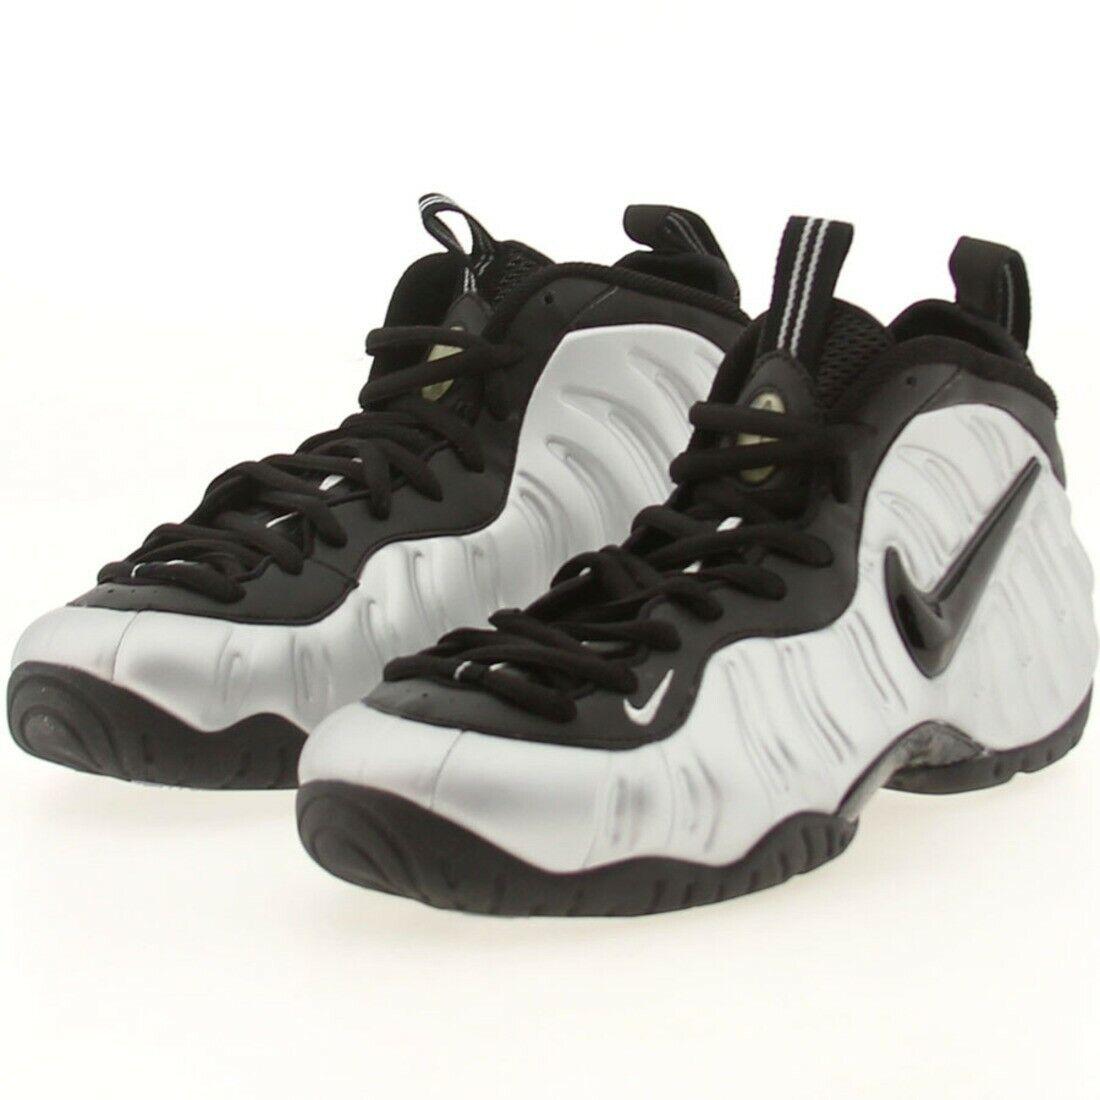 US sz 11.5 Nike Air Foamposite Pro Metallic Silver Black OG 2006 Release Size 11